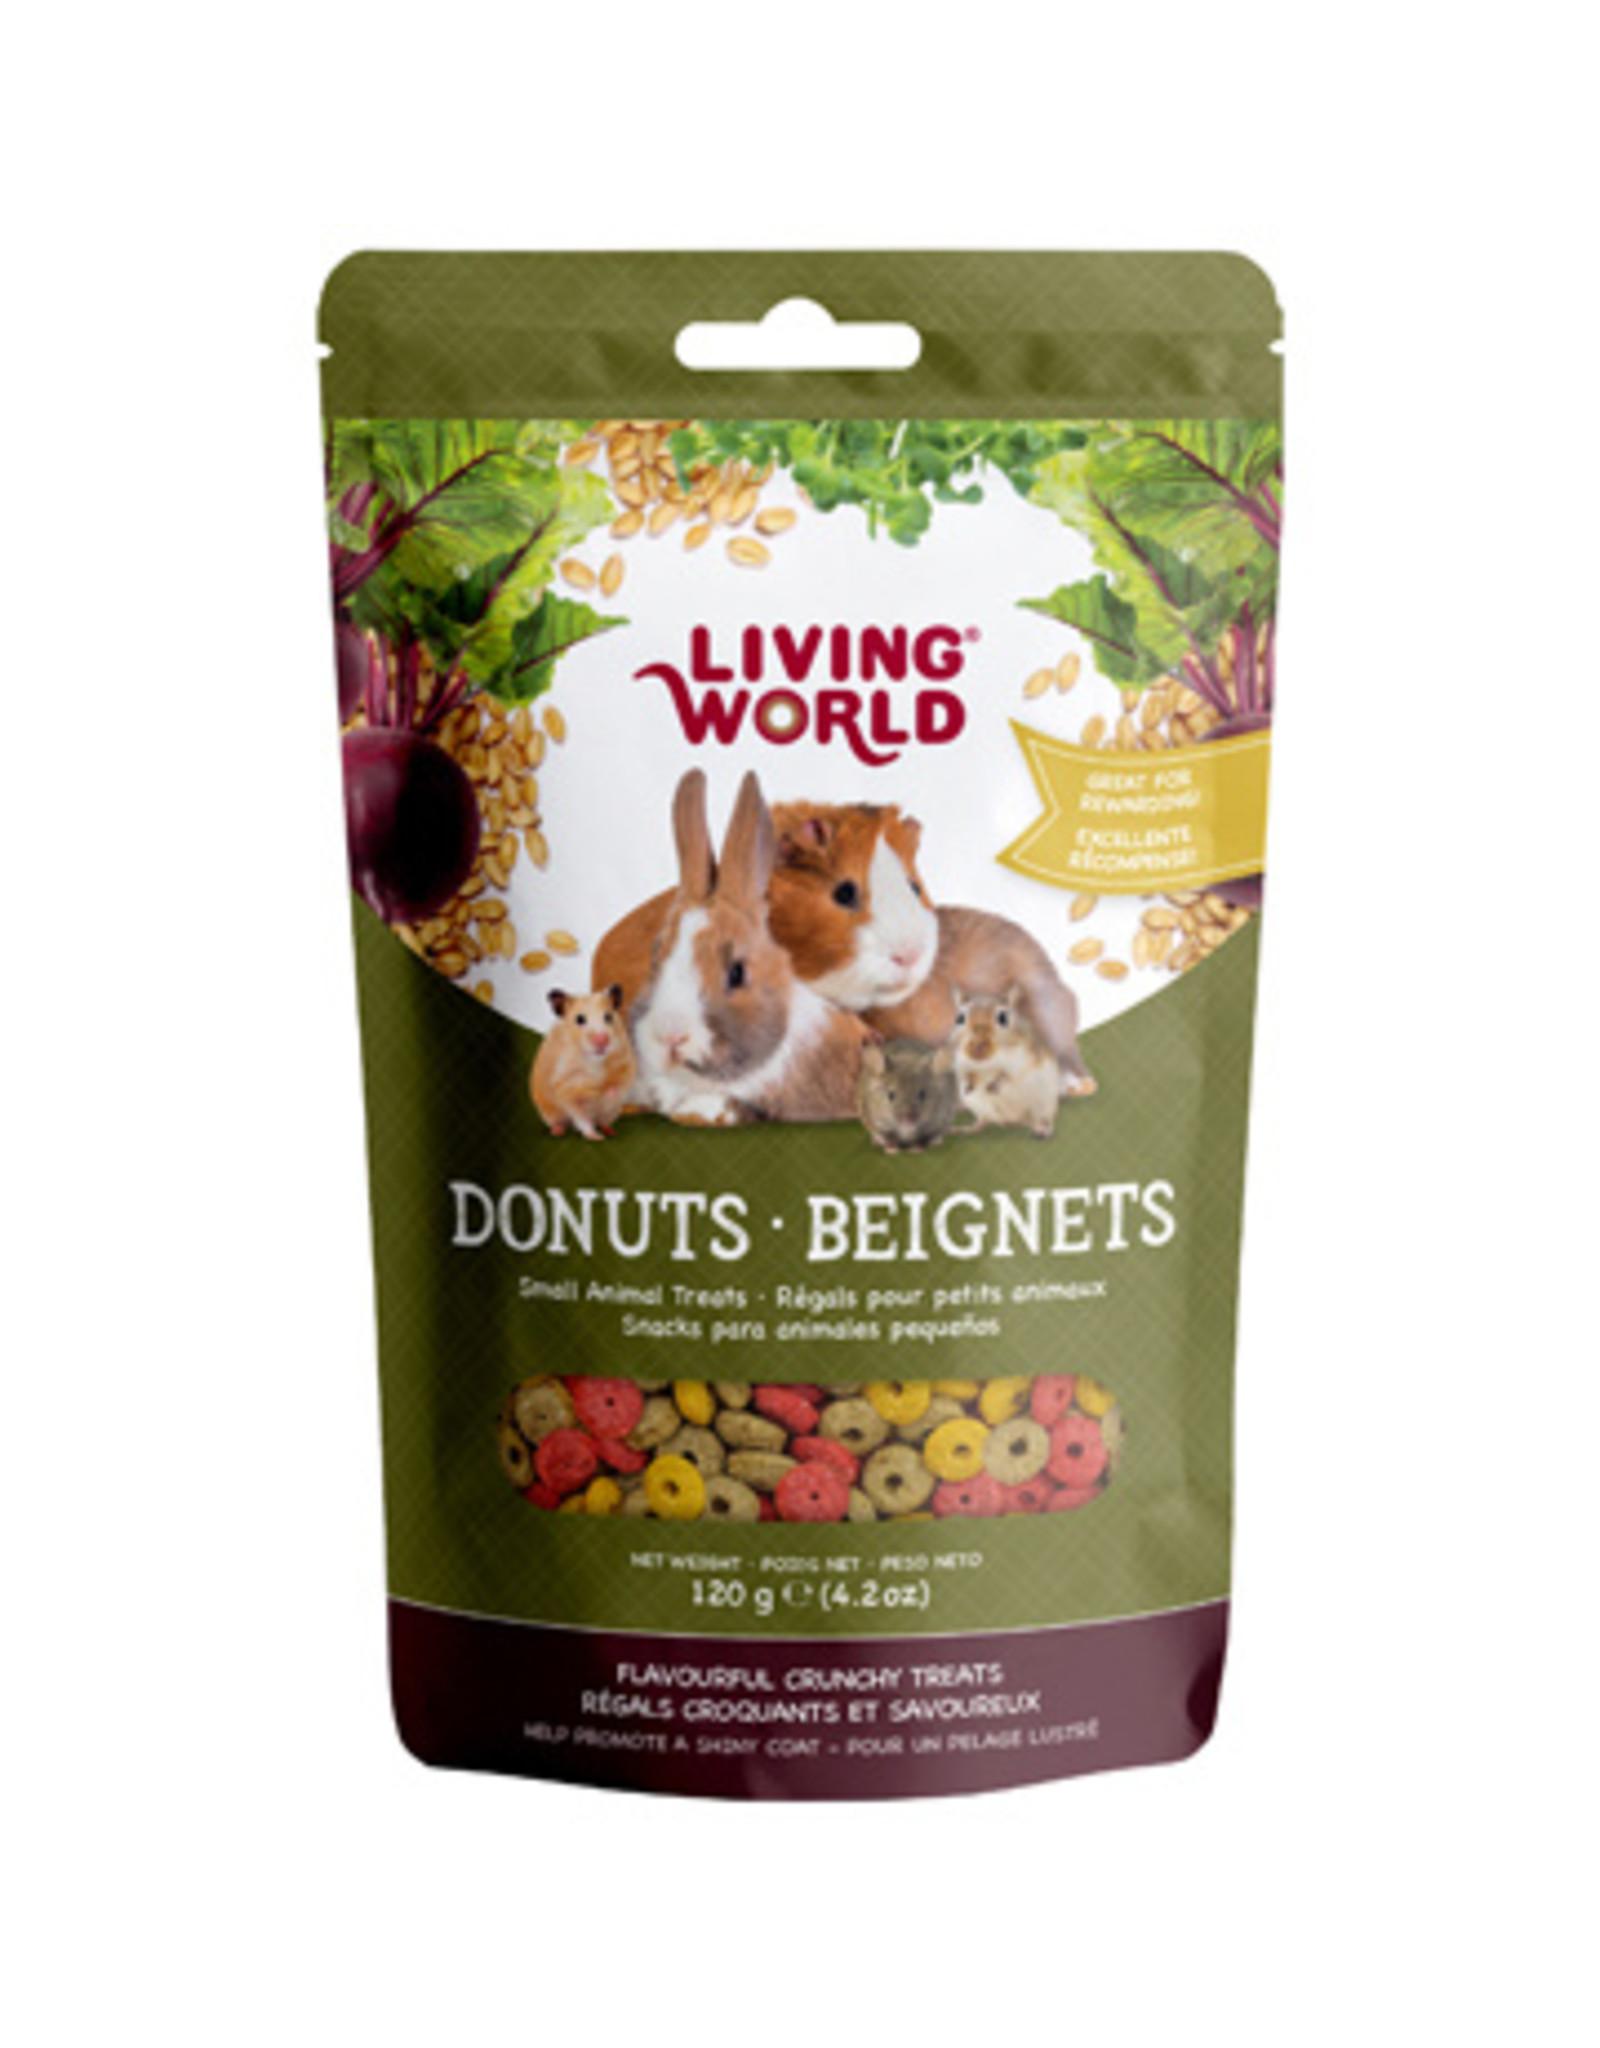 Living World LIVING WORLD Donuts 120g